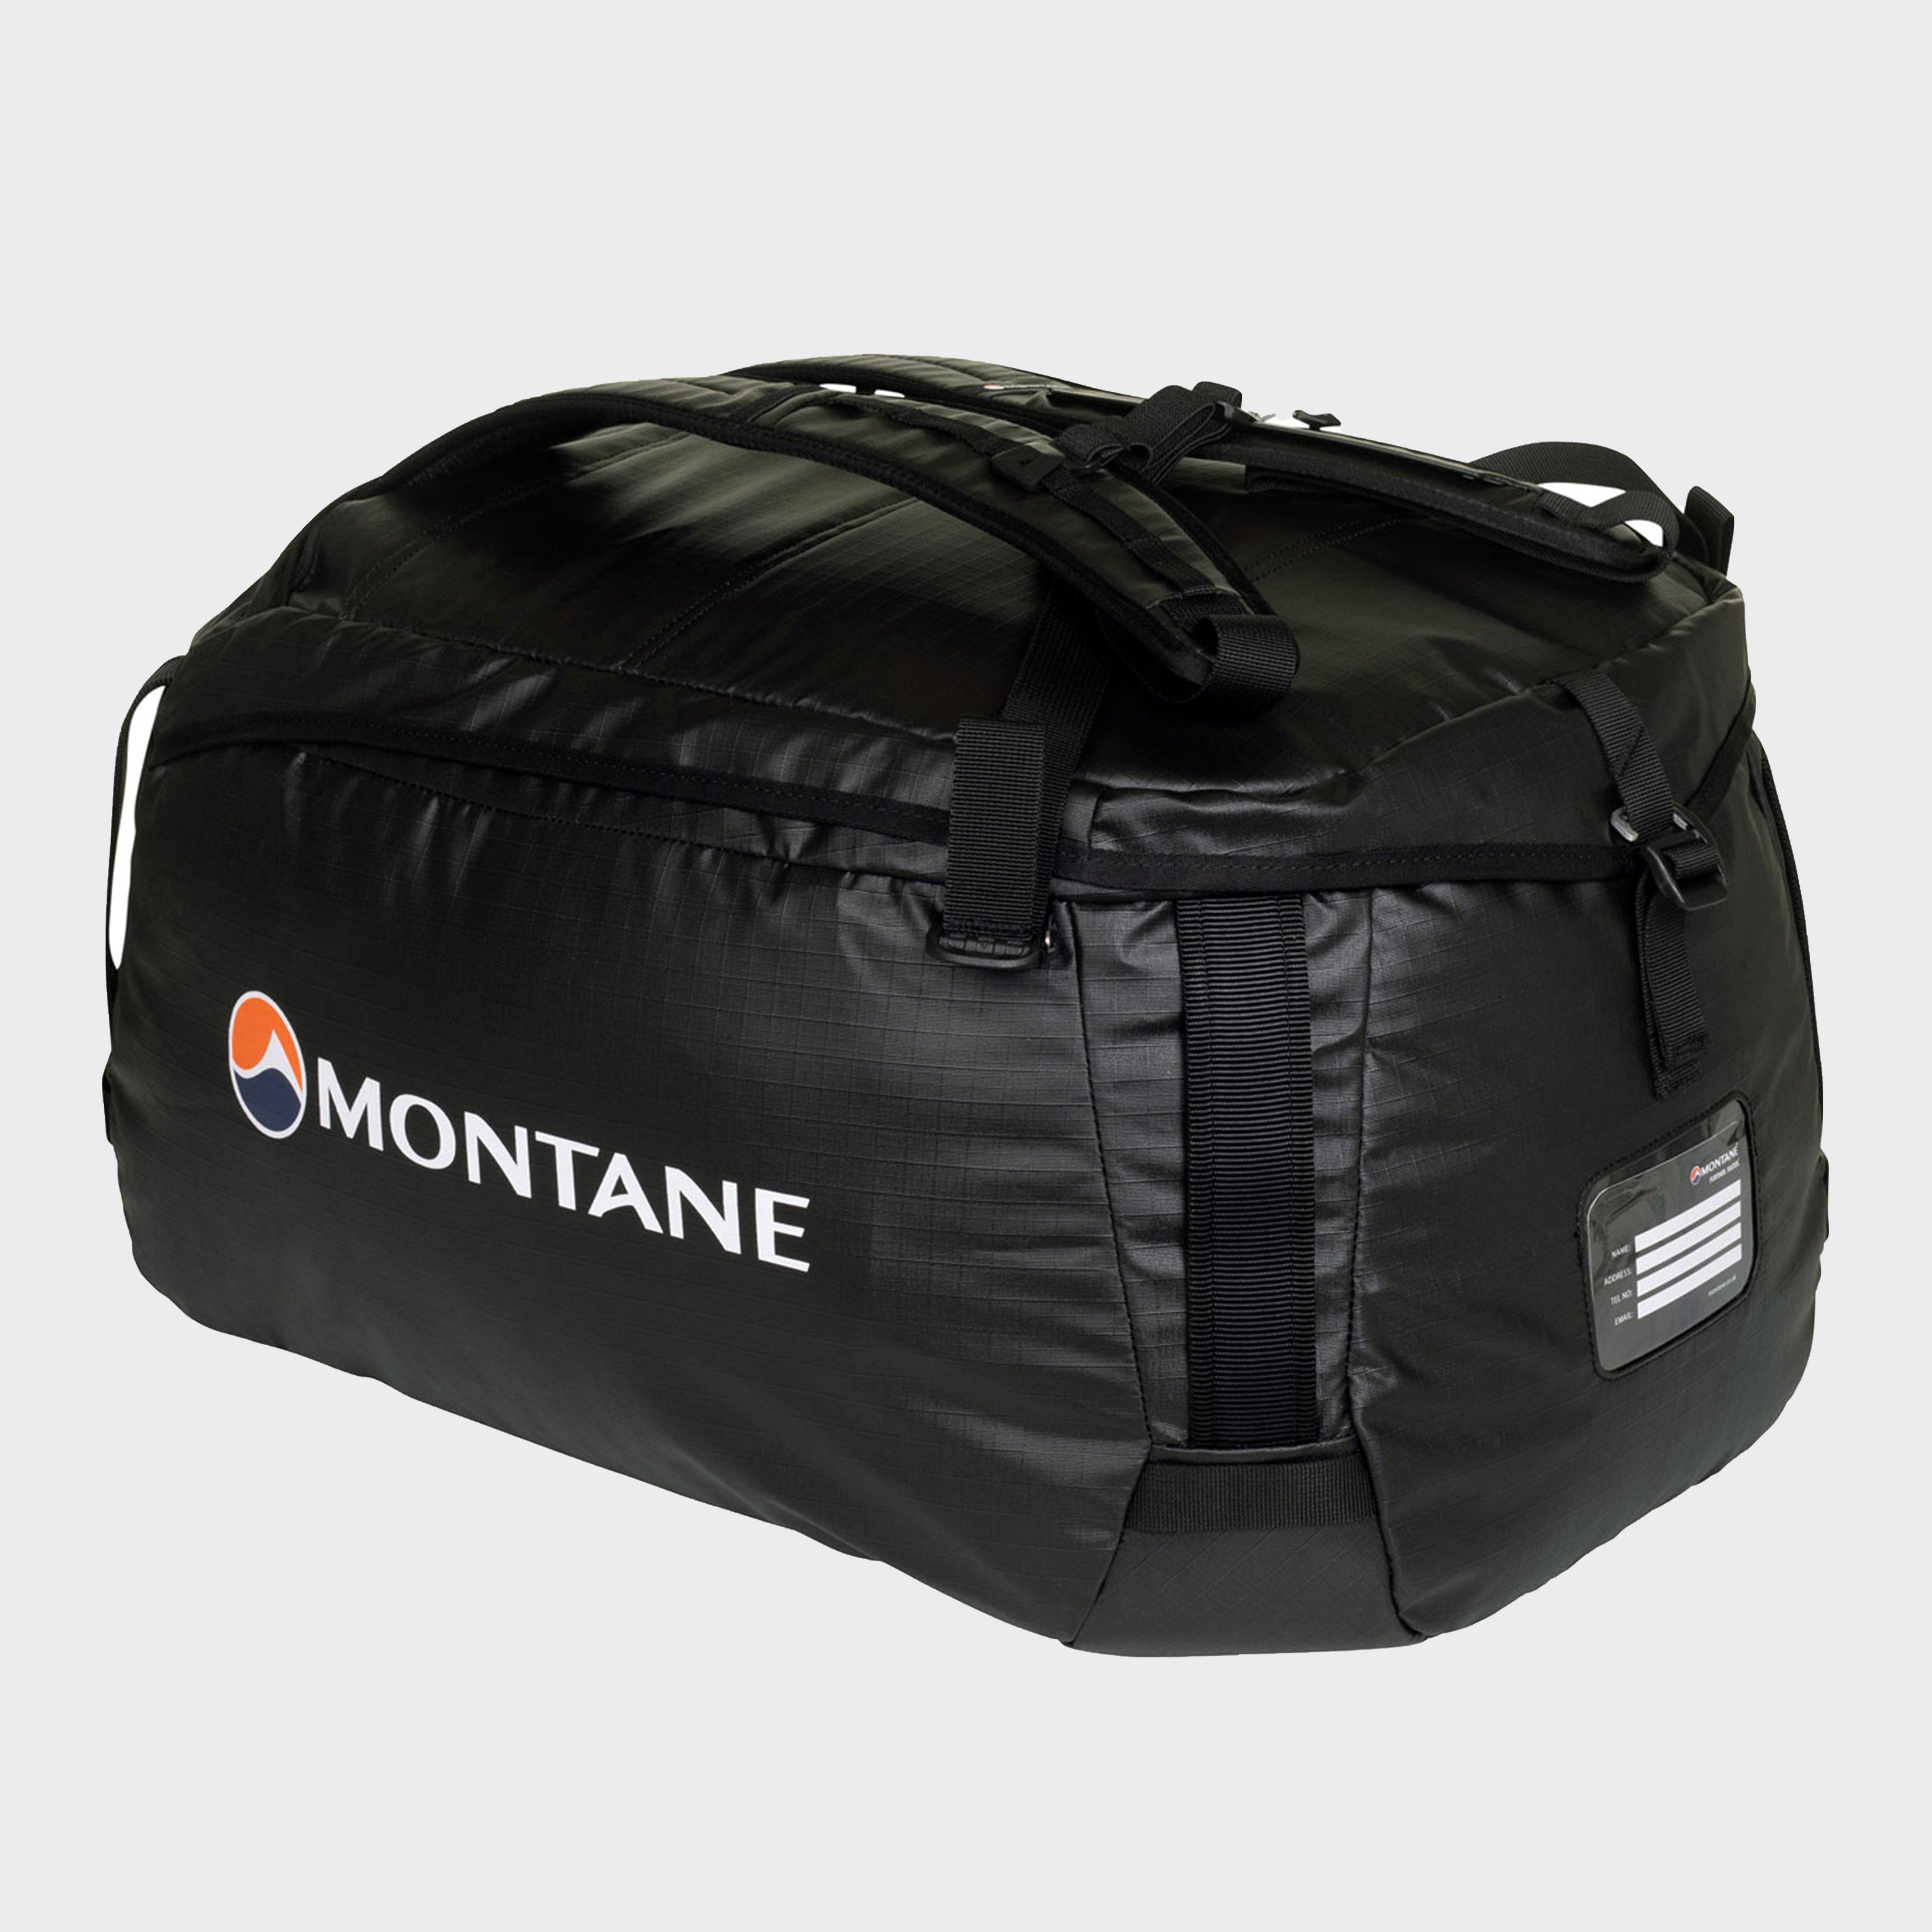 Montane Montane Transition 40 Duffle Bag